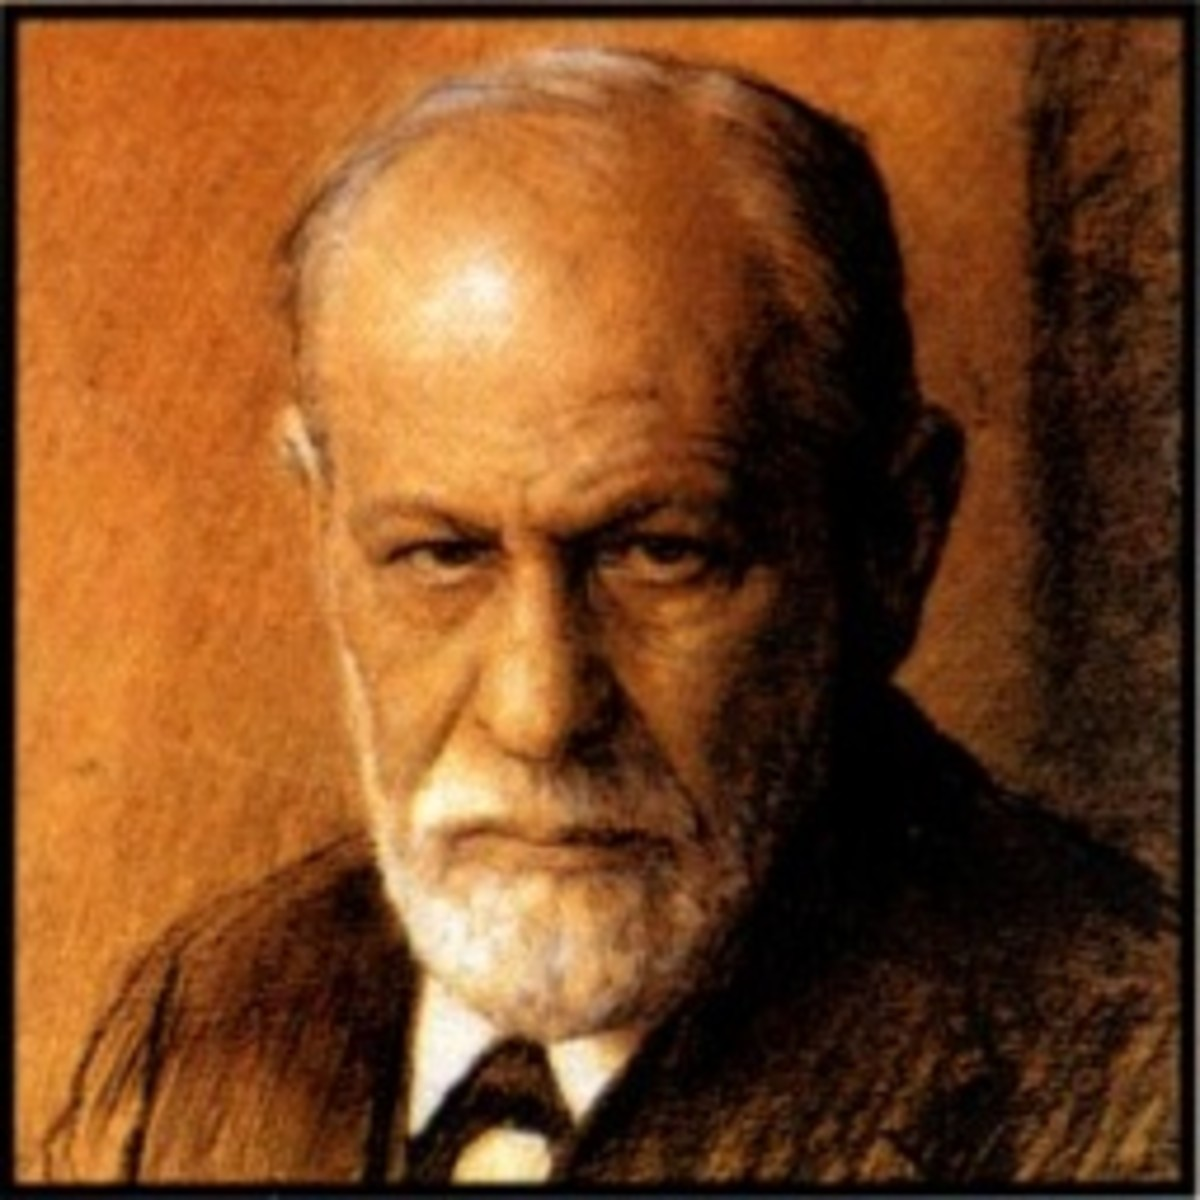 Sigmund Freud Father of Psychoanalysis